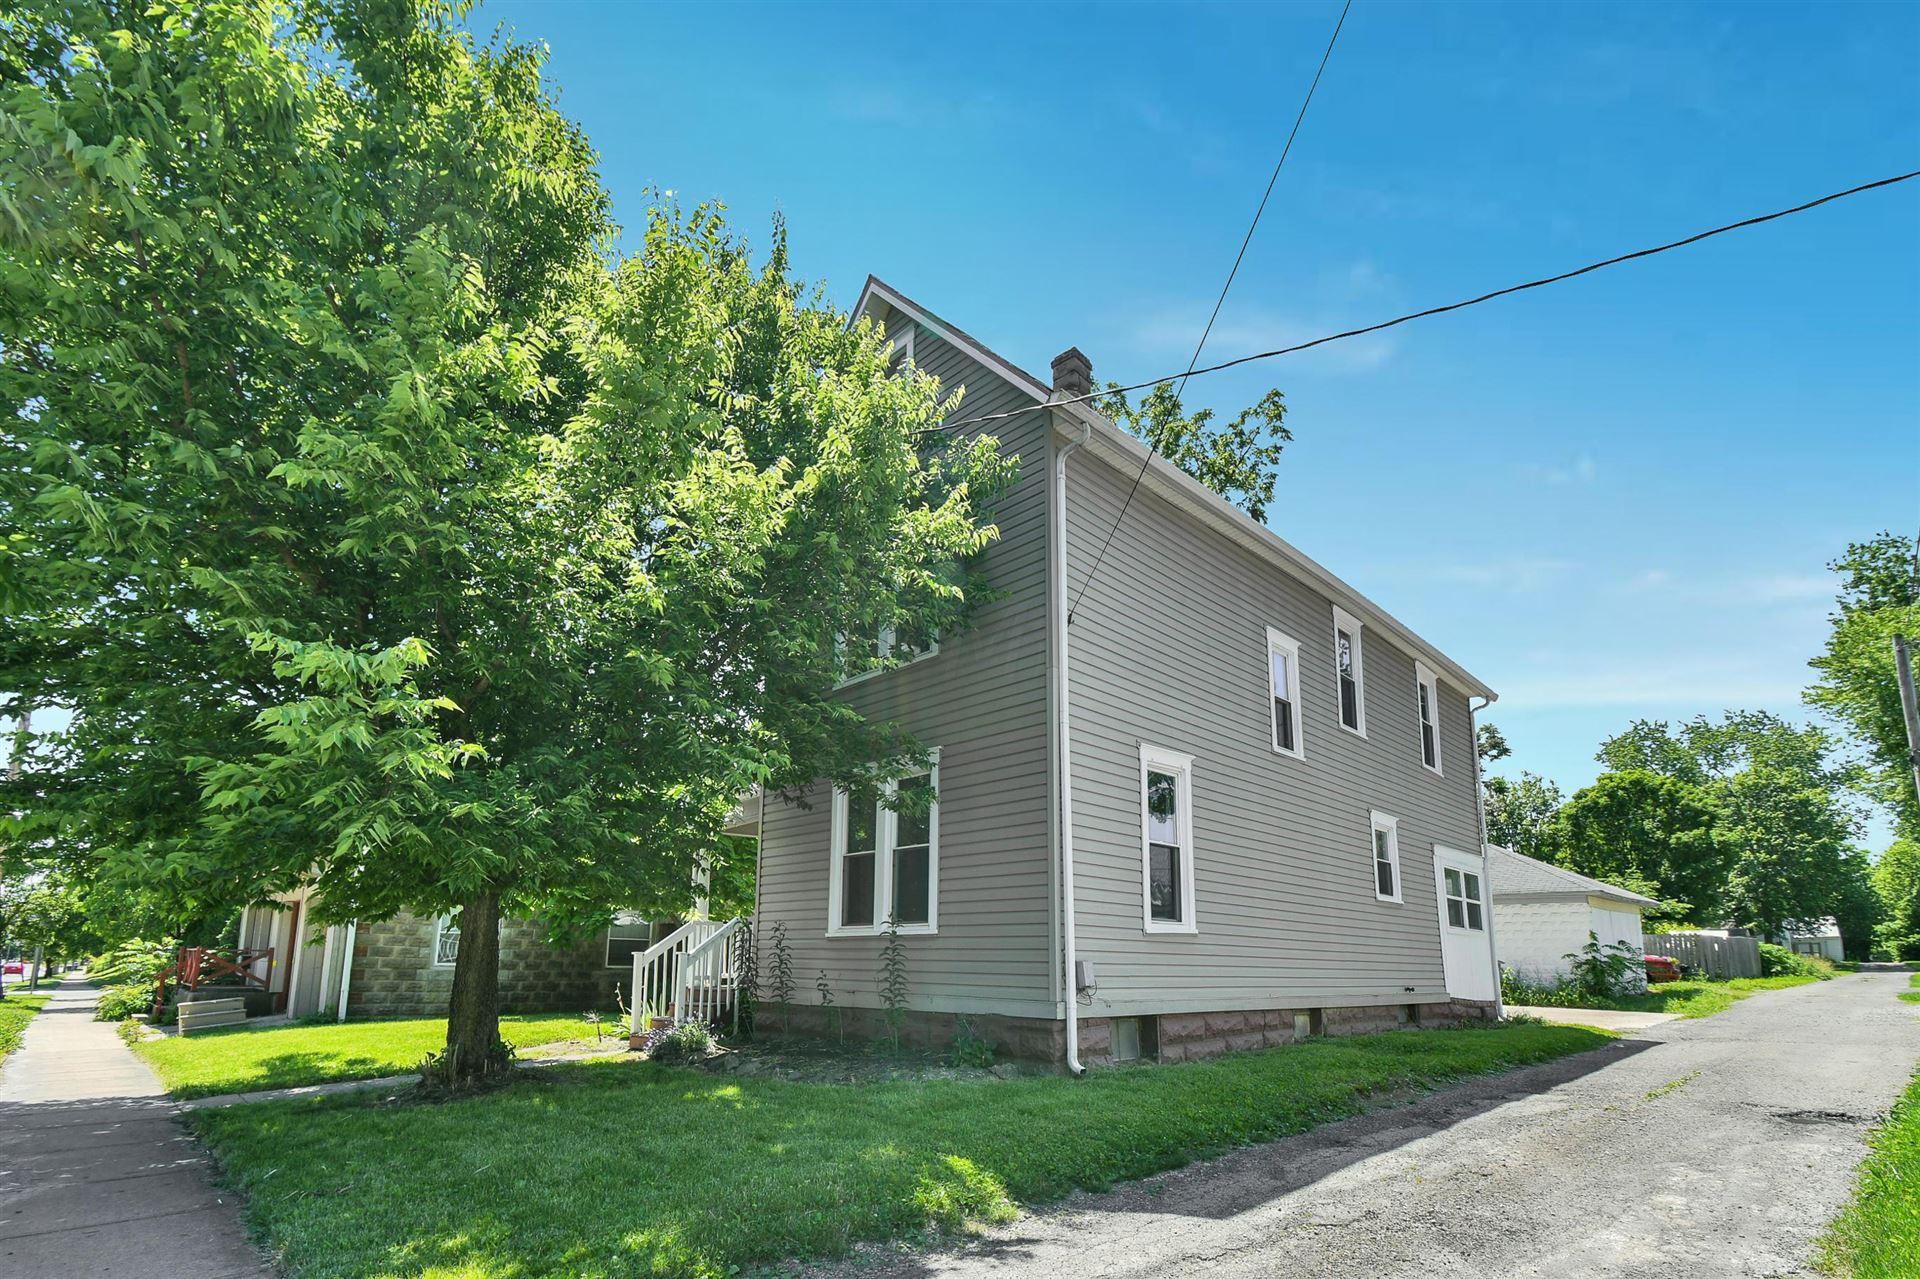 Photo of 351 W William Street, Delaware, OH 43015 (MLS # 221021854)